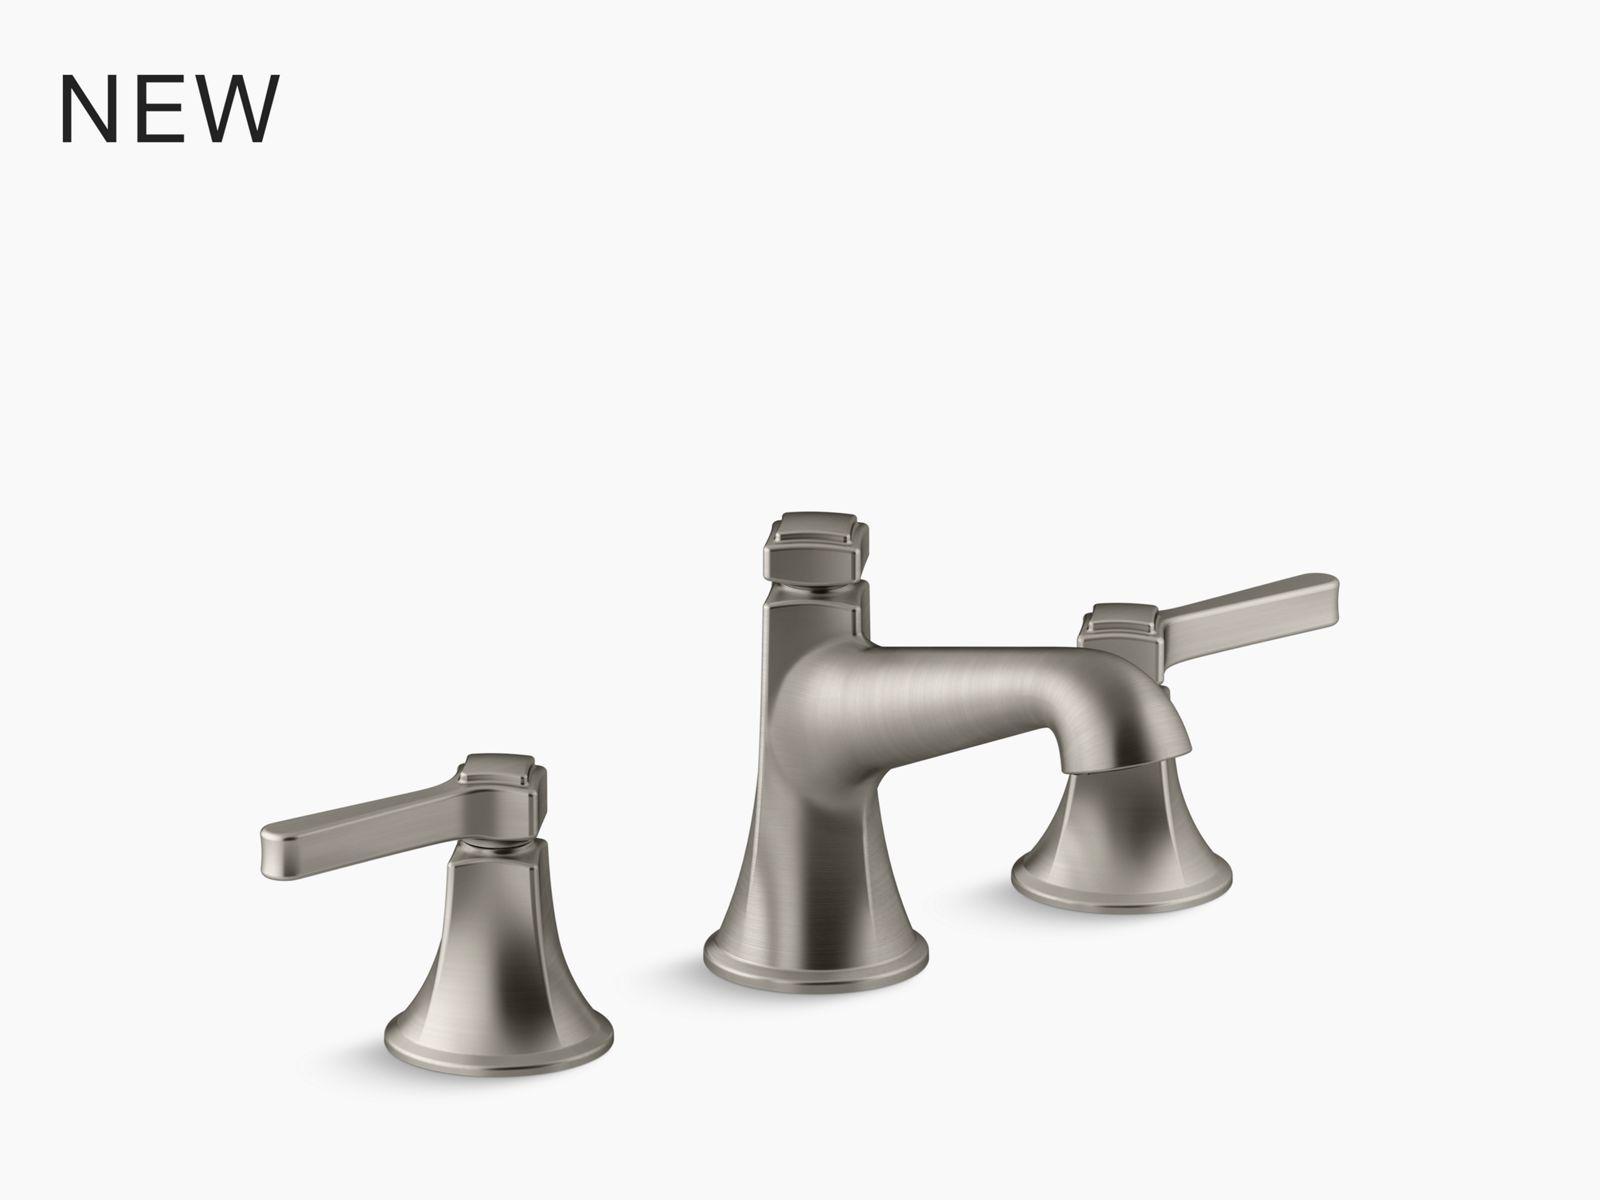 standing bath shower faucet 73087t b4